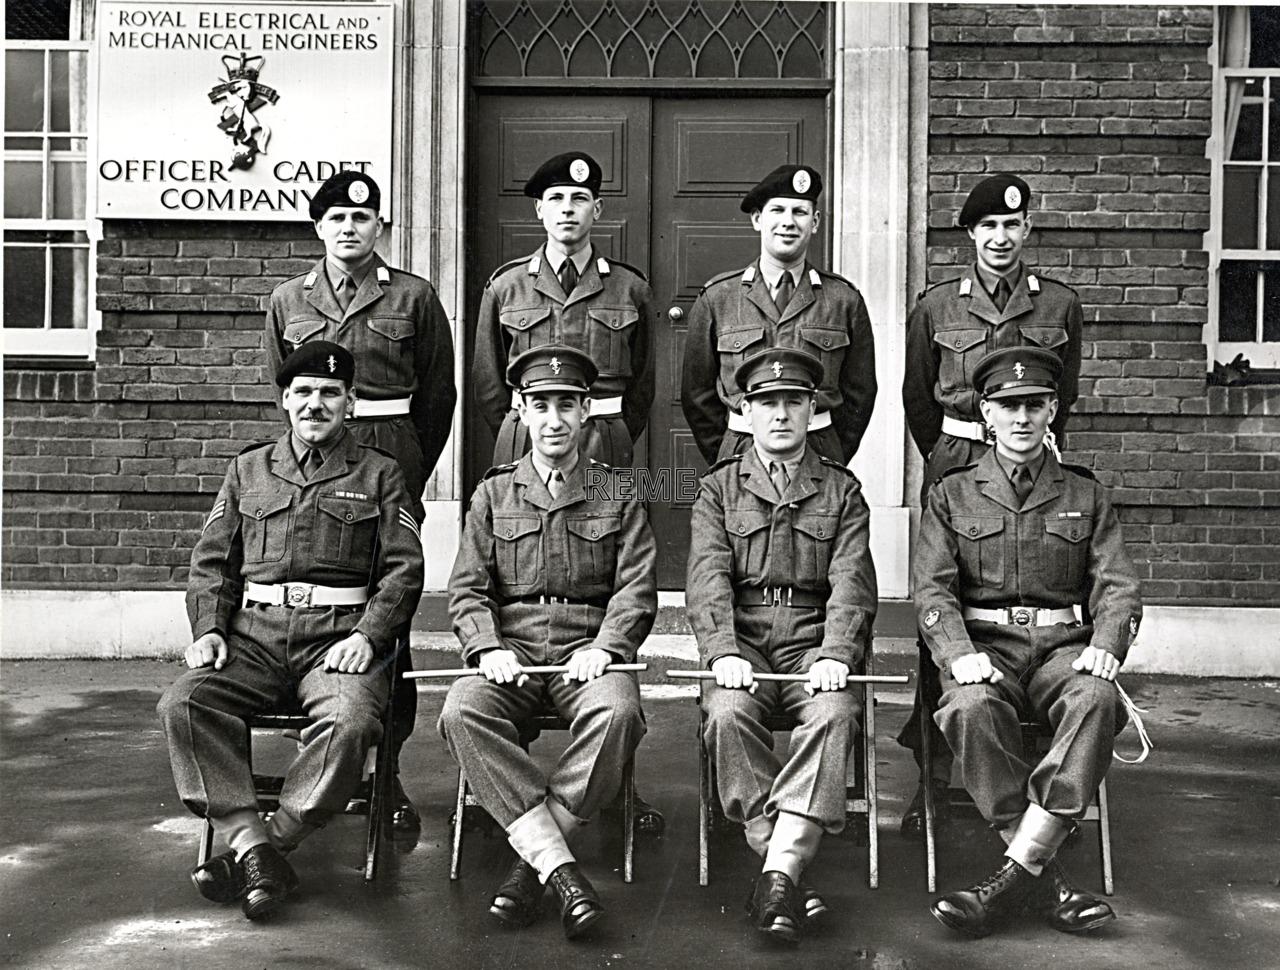 No 55 Cadet Officer General Course, Bordon: December 1957